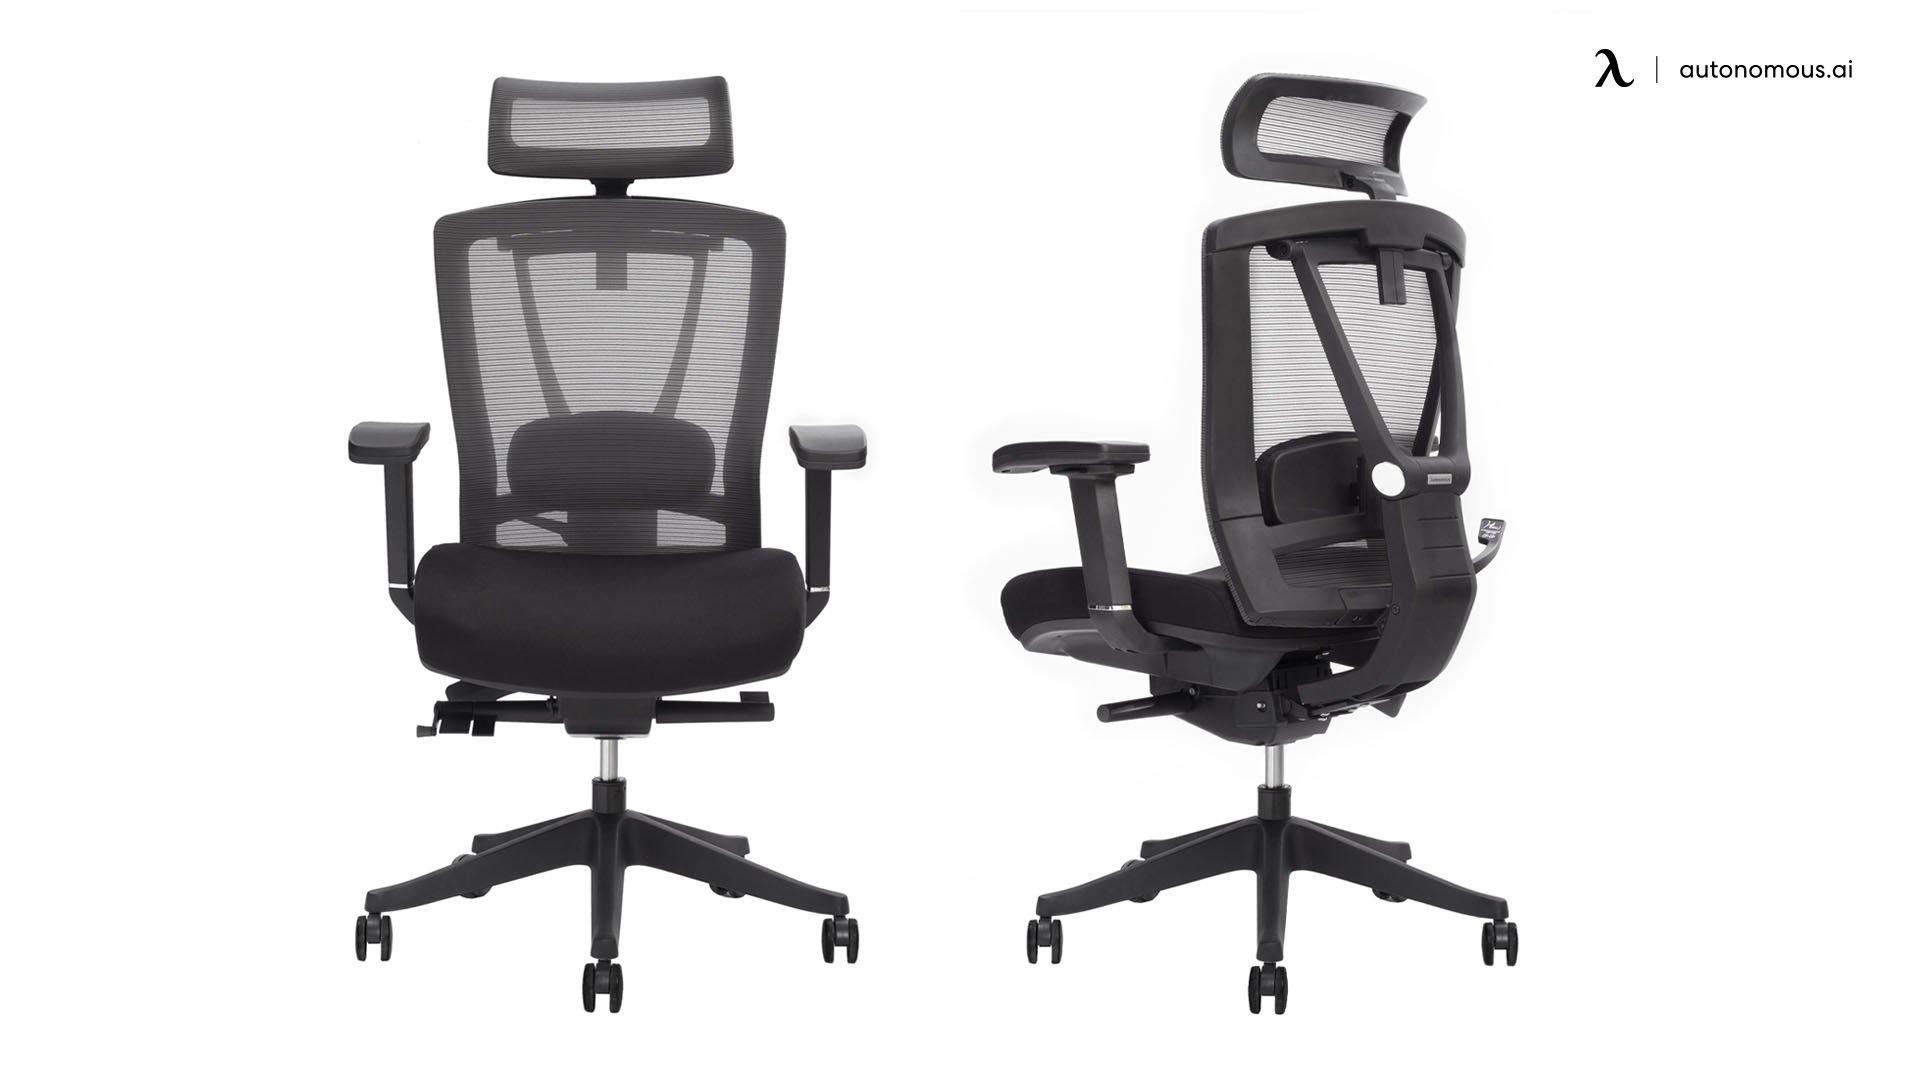 ergonomic gaming chair Autonomous ErgoChair 2